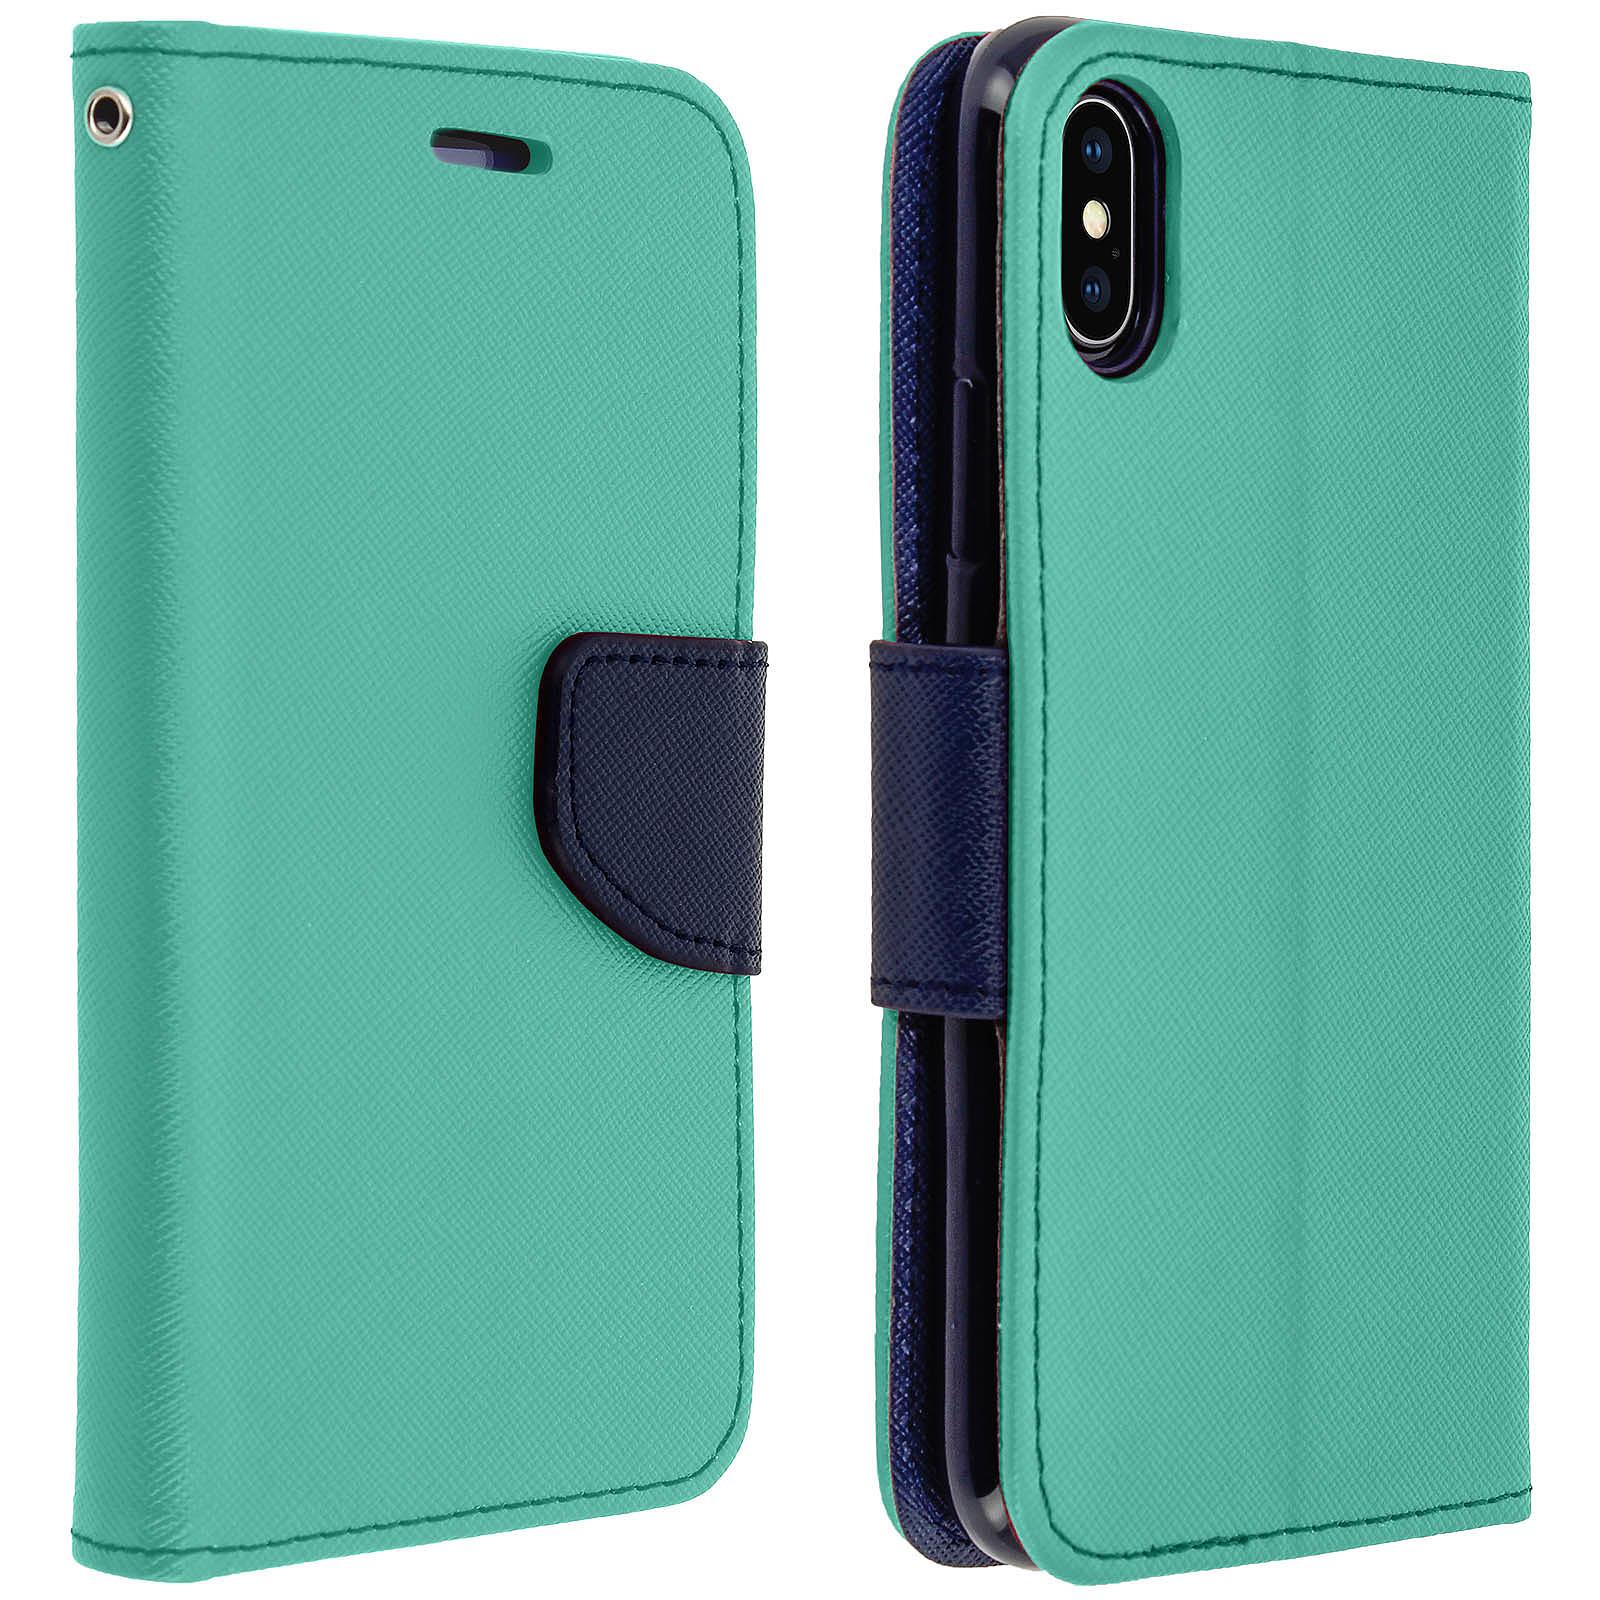 Avizar Etui folio Turquoise pour Apple iPhone X , Apple iPhone XS